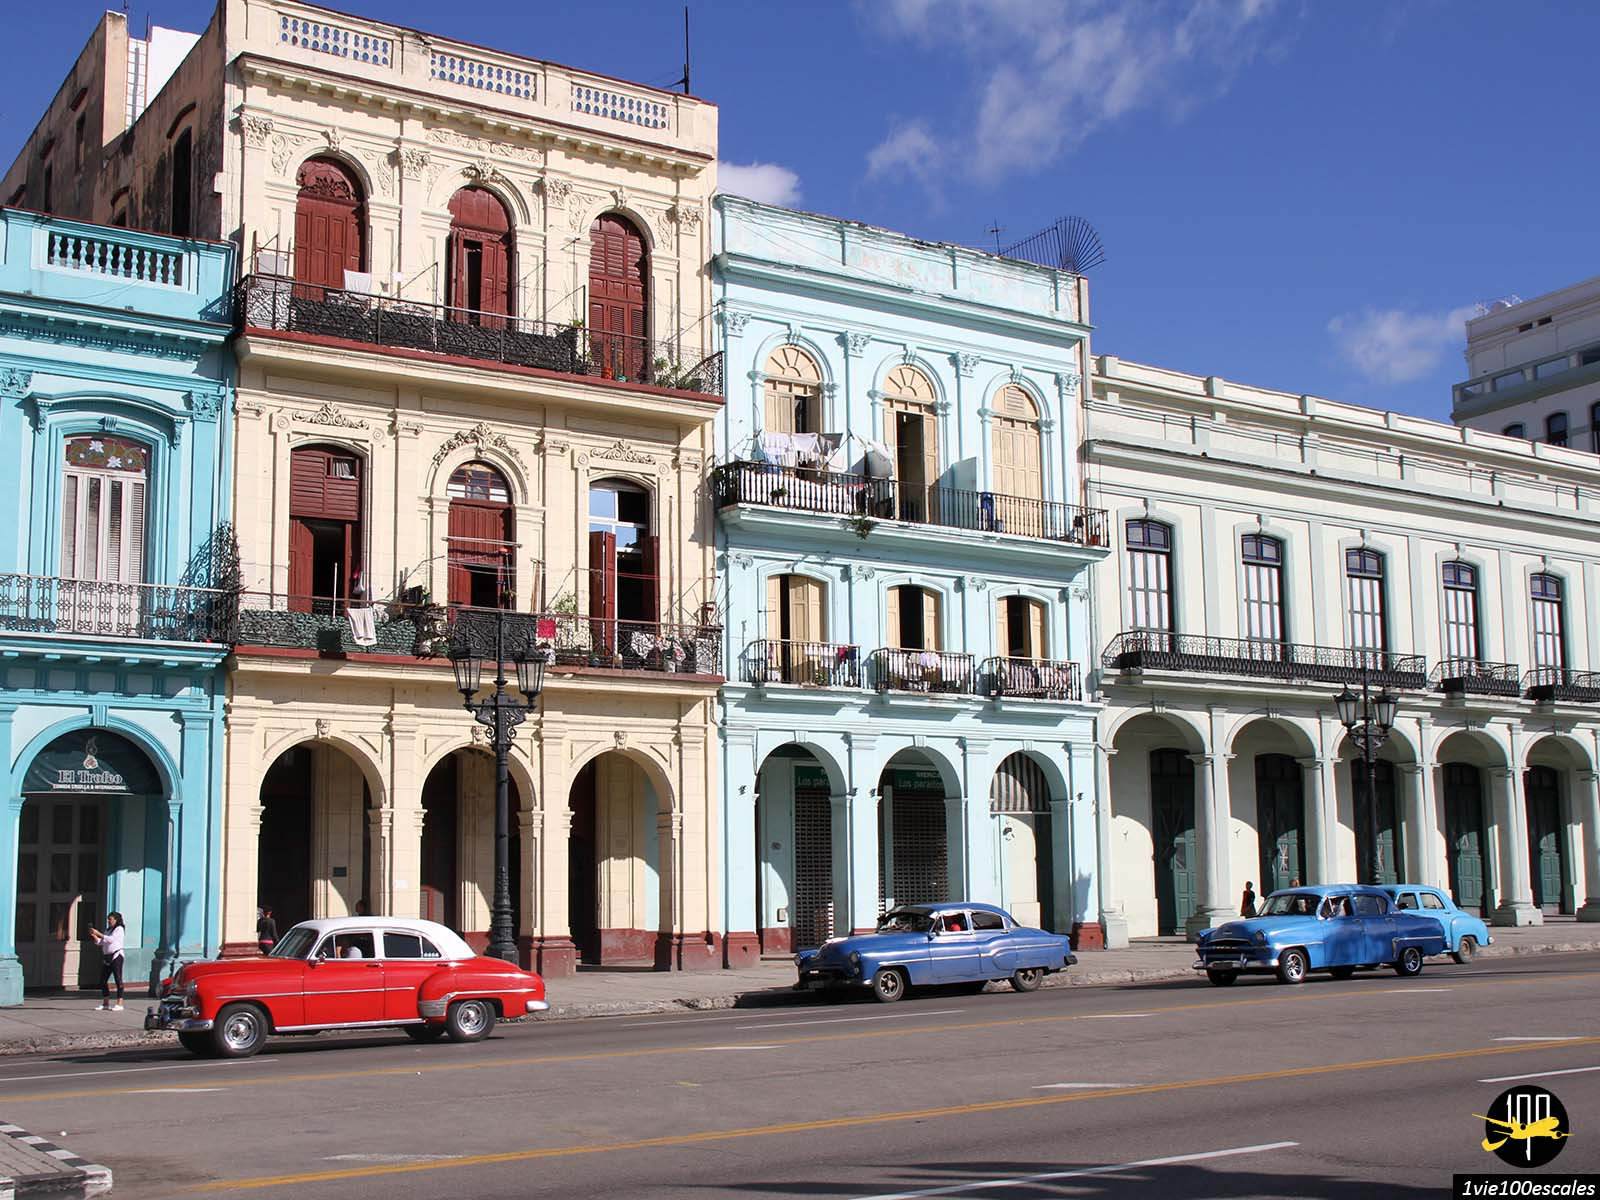 Escale #141 La Havane